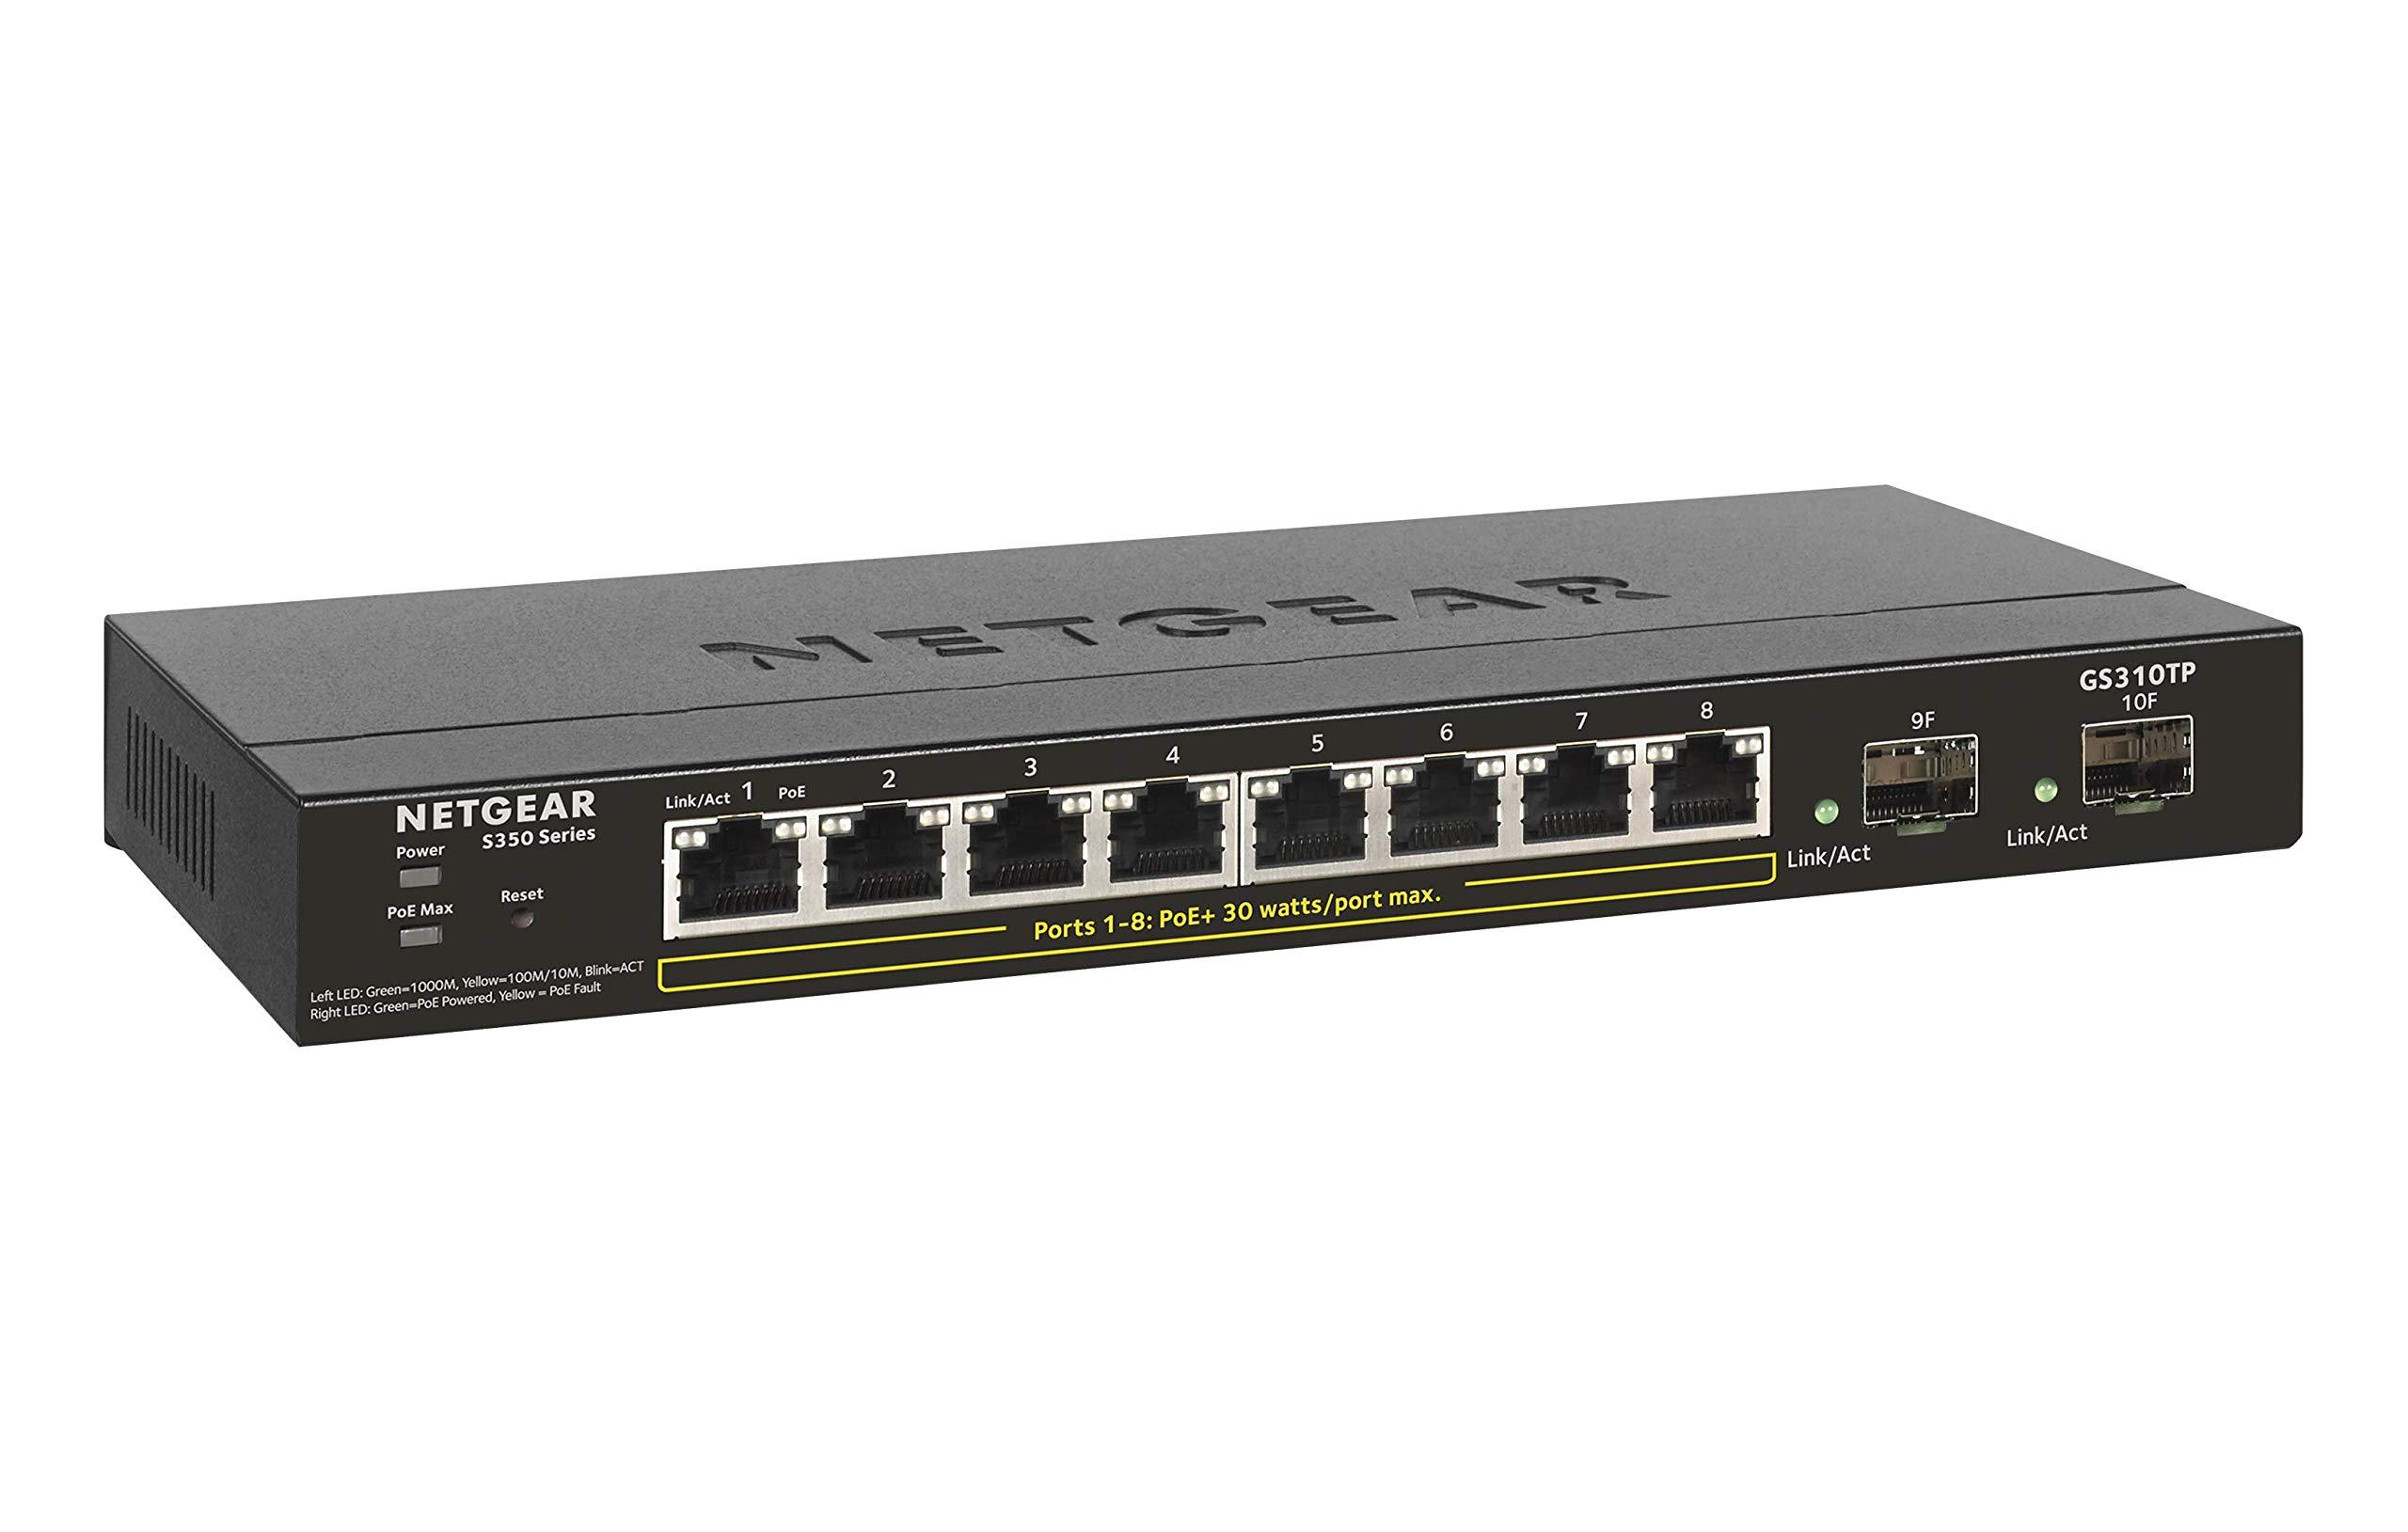 NETGEAR 10-Port Gigabit Ethernet Smart Managed Pro PoE Switch (GS310TP) - with 8 x PoE+ @ 55W, 2 x 1G SFP, Desktop, Fanless Housing for Quiet Operation, S350 Series by NETGEAR